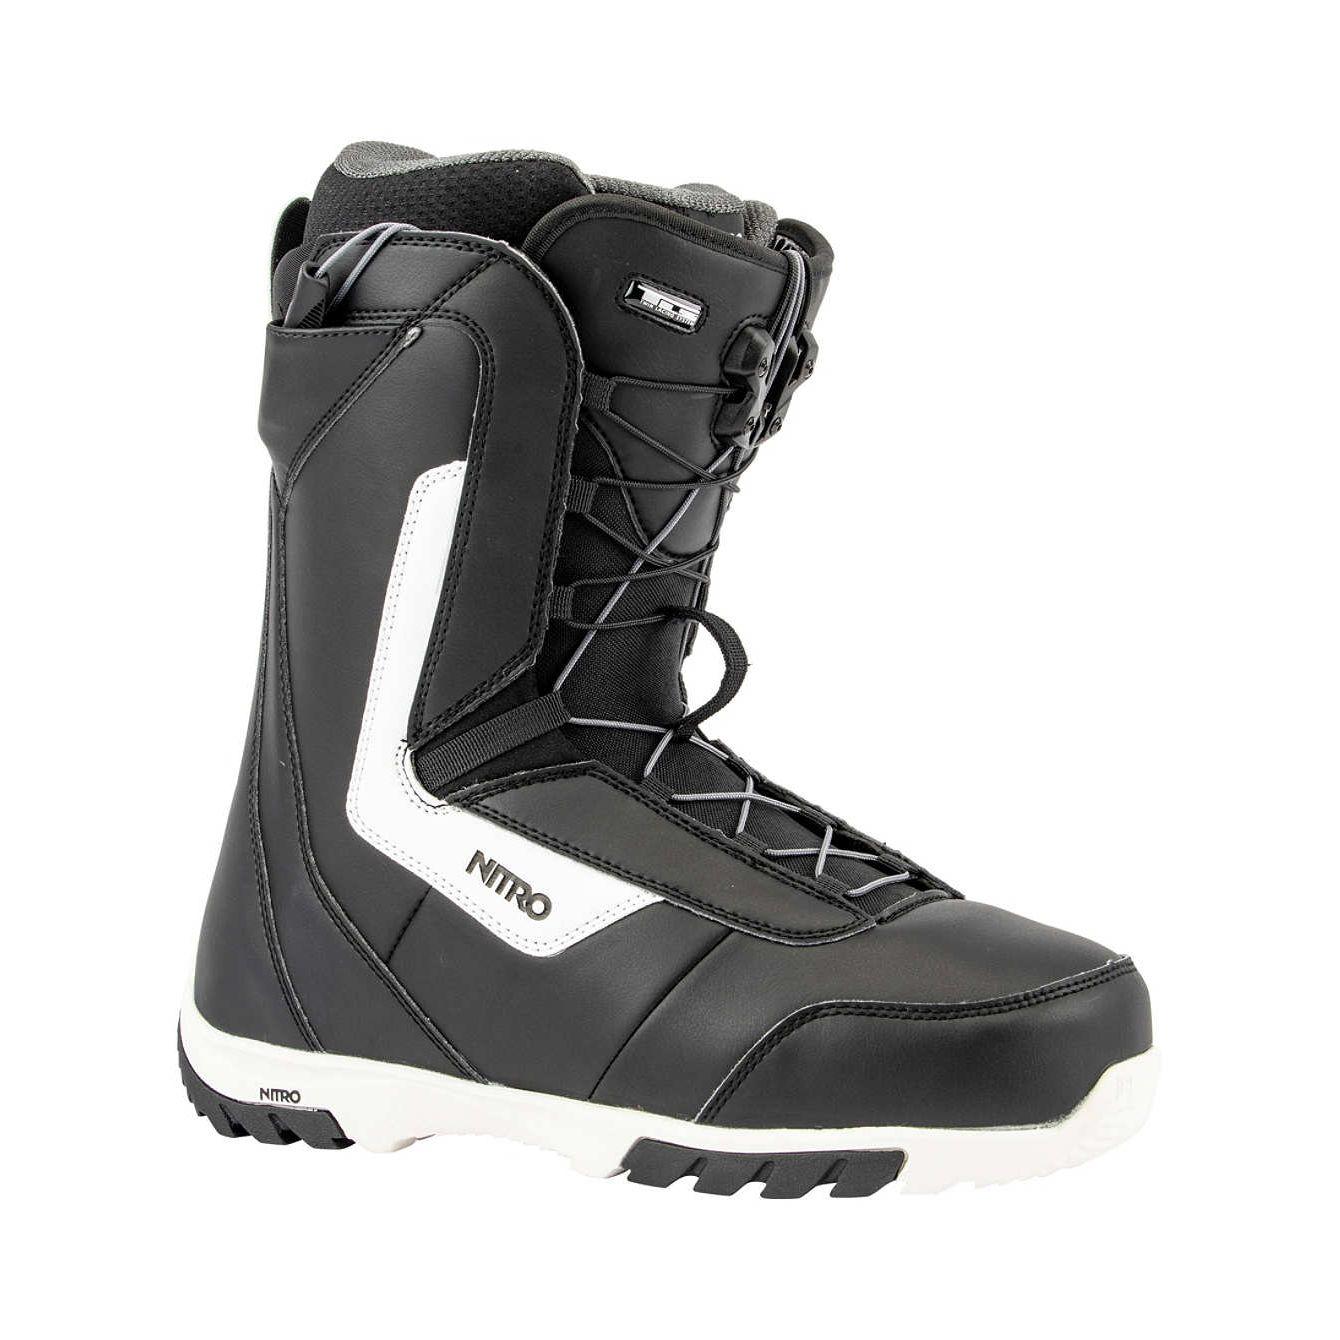 Boots snowboard barbati Nitro Sentinel TLS Negru/Alb 19/20 imagine